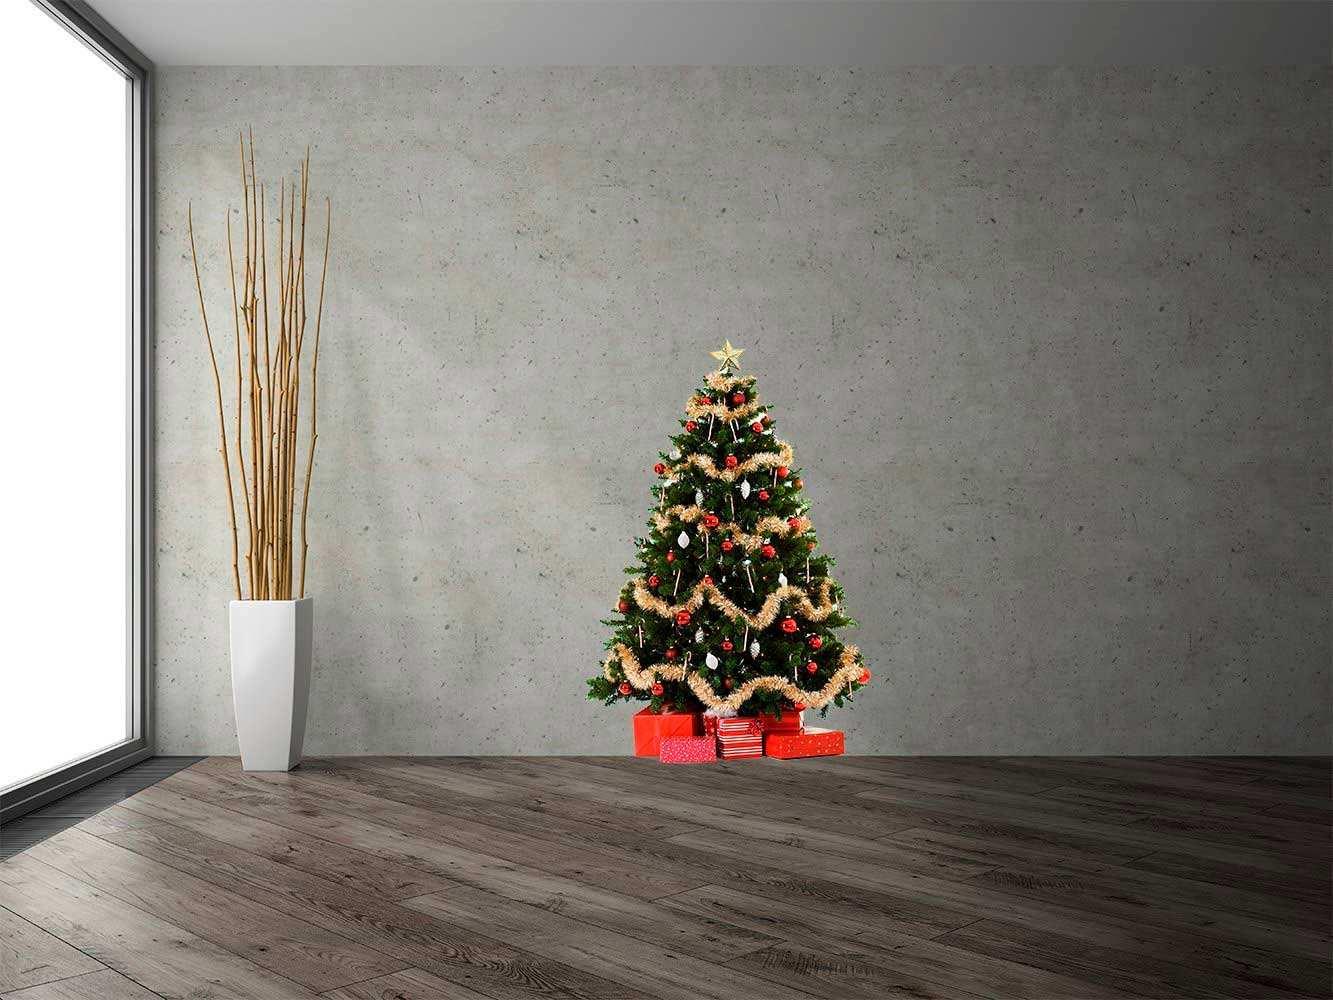 vinilo arbol navidad Vinilo Decorativo Arbol Navidad